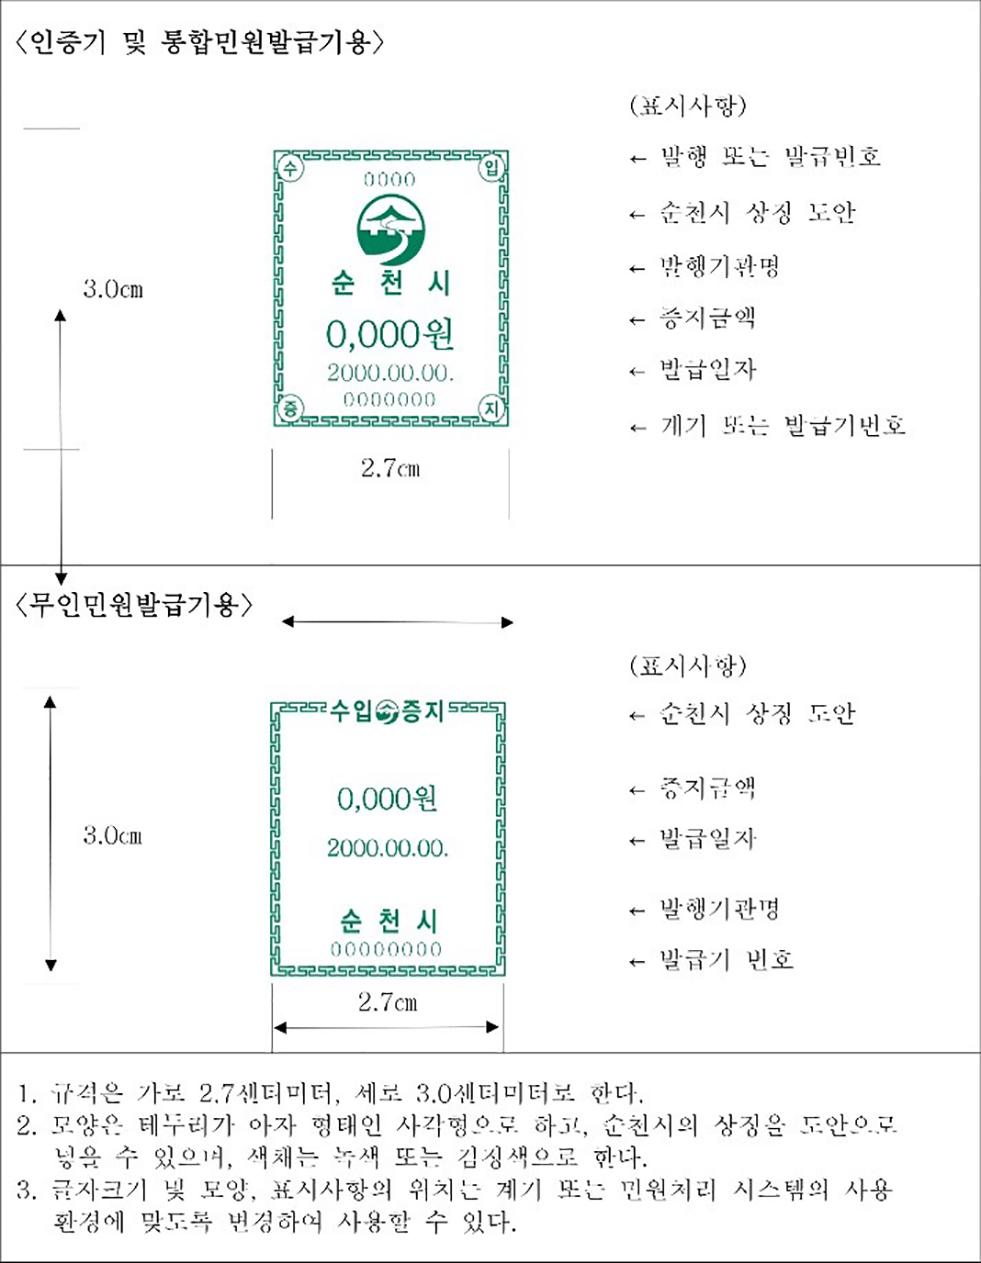 ordinance_example_meter_revenues_981px